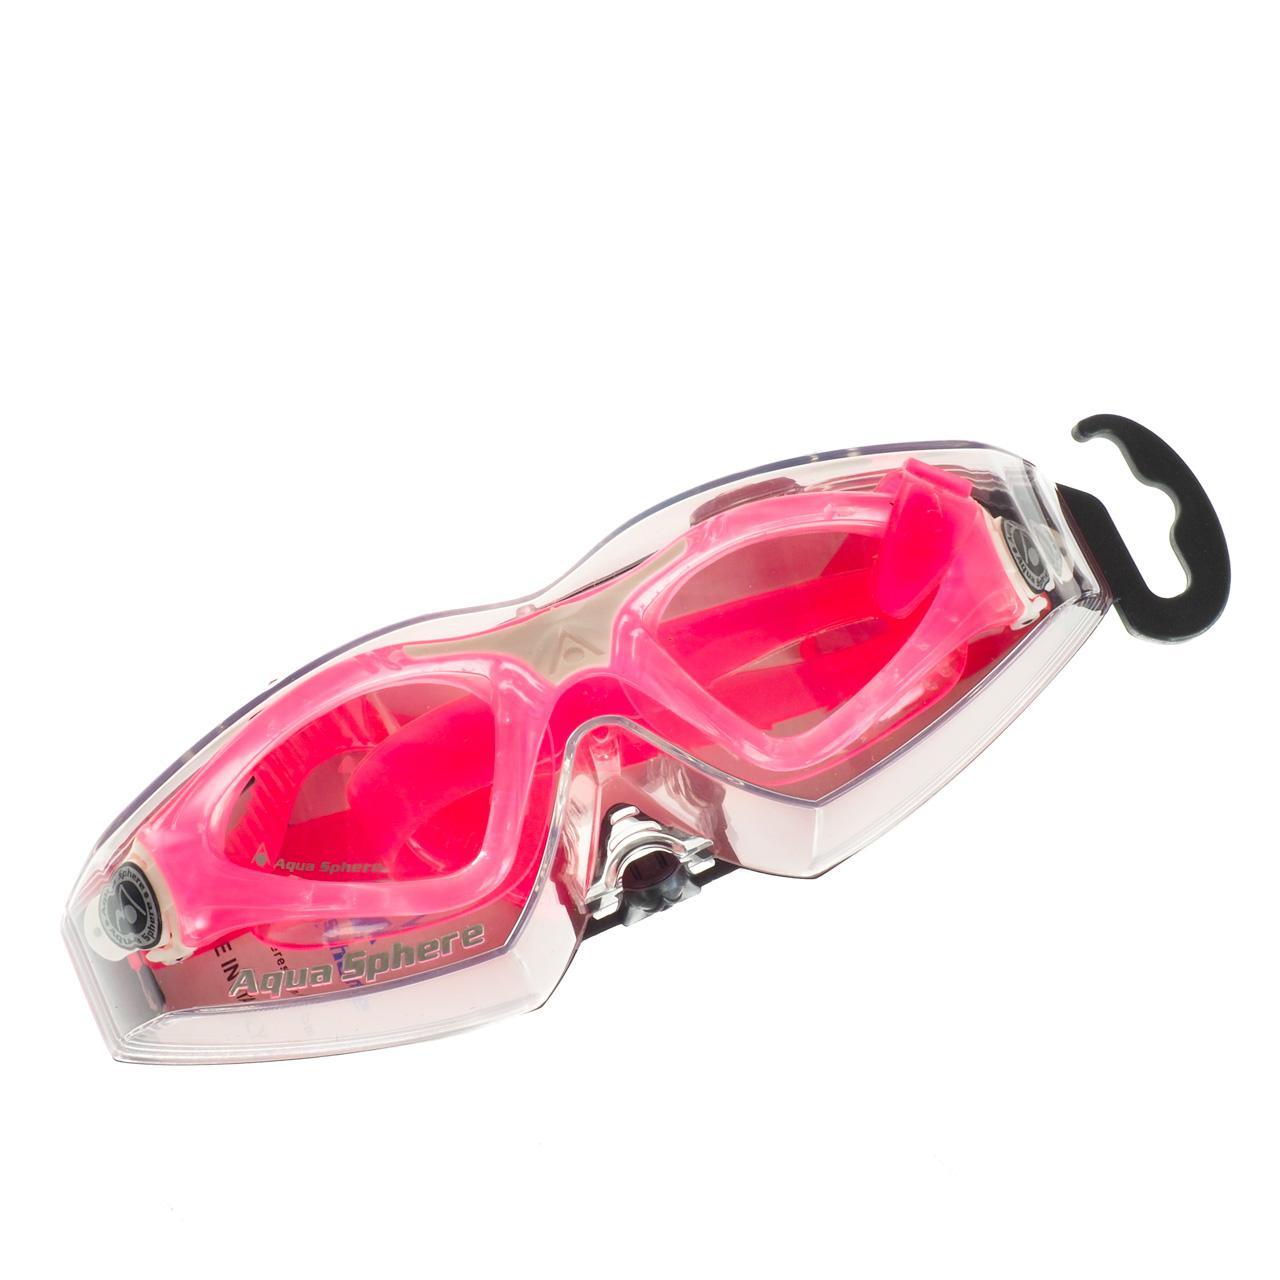 Brille-Bade-Schwimmbad-Aqua-sphere-Kayenne-Jr-Rosa-Wht-CL-L-Rosa-28586-Neu Indexbild 4